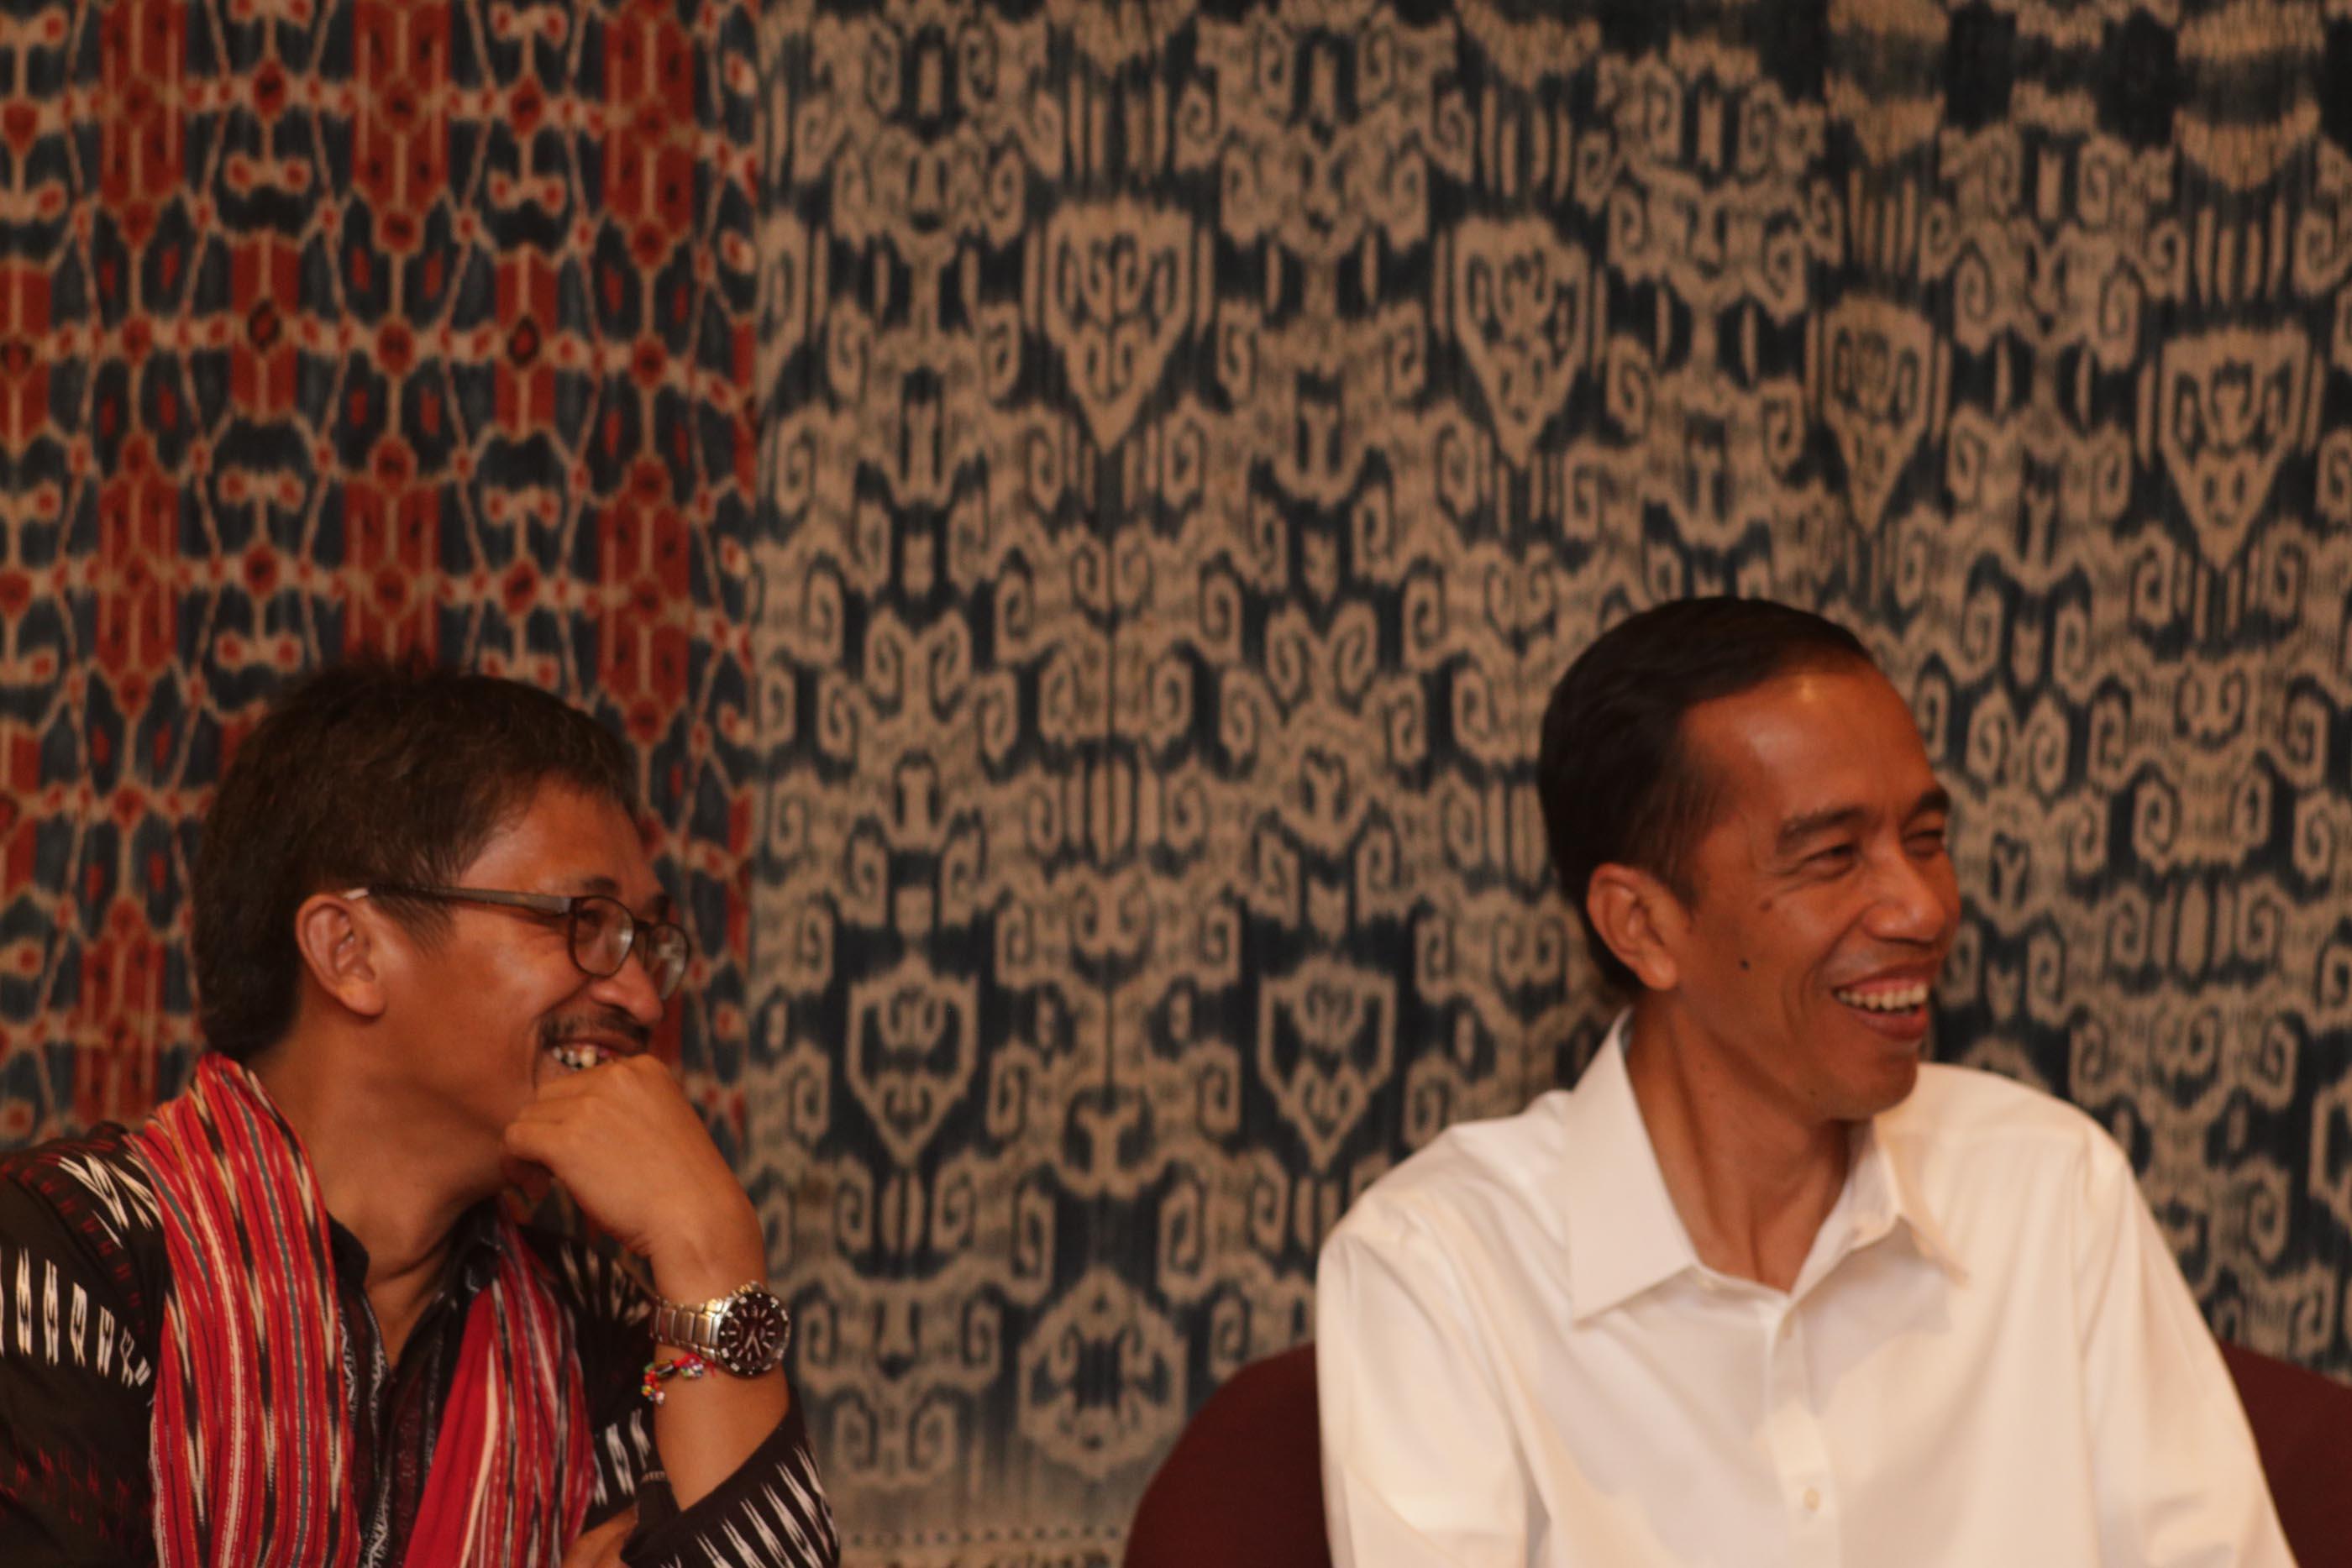 AMAN Kampanyekan Jokowi via Twitter